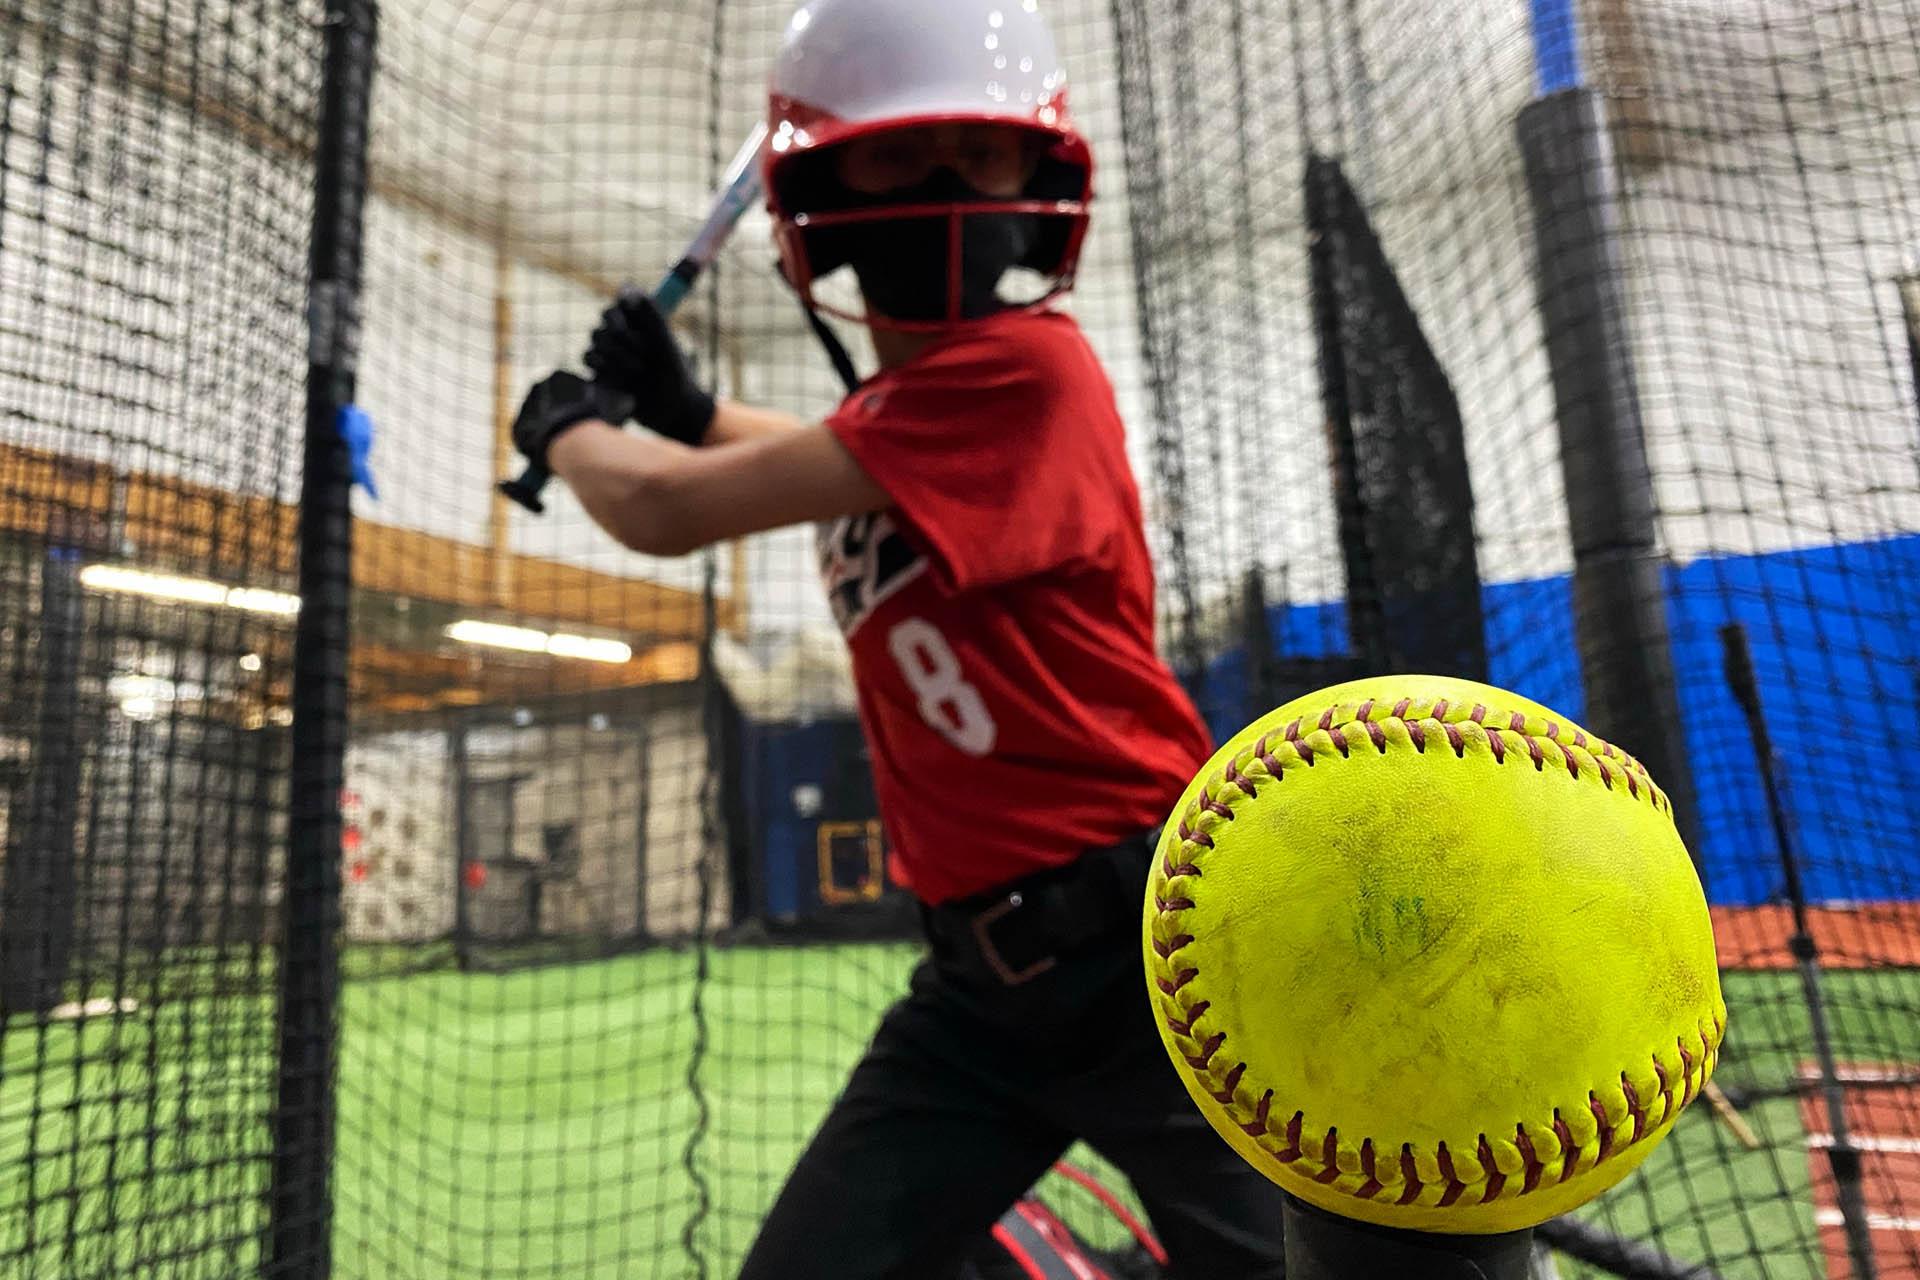 Girl Hitting a Softball Off a Tee